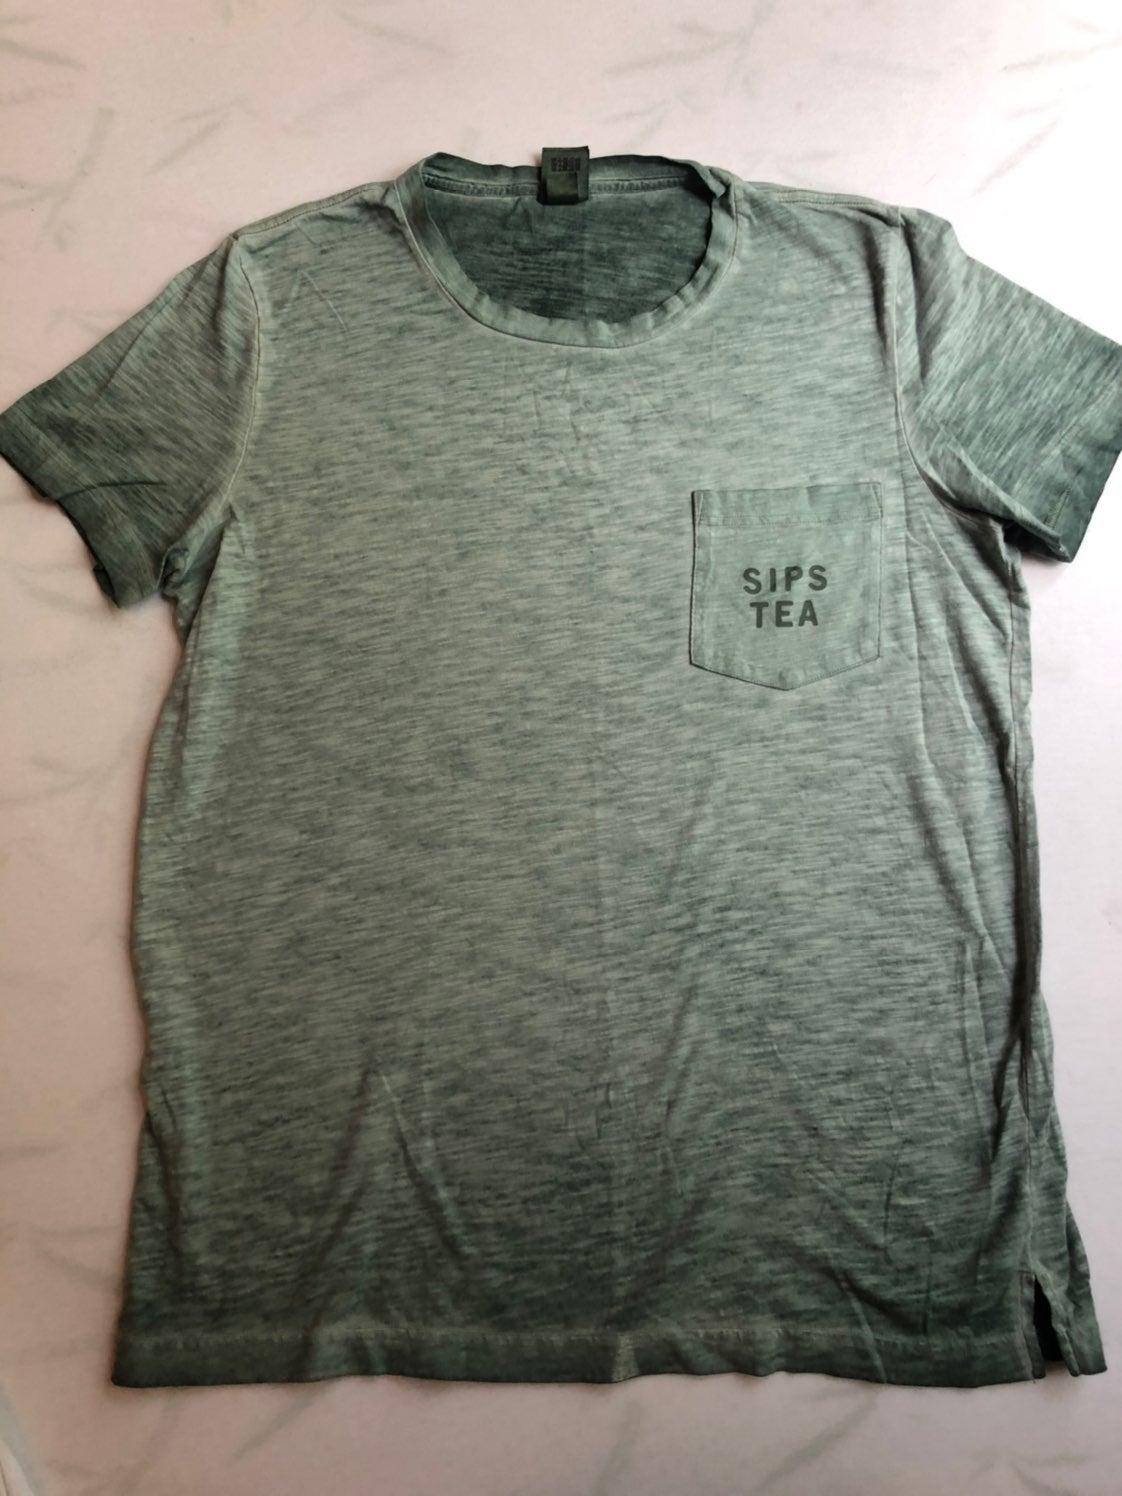 Victoria Secret PINK Crew Tee shirt